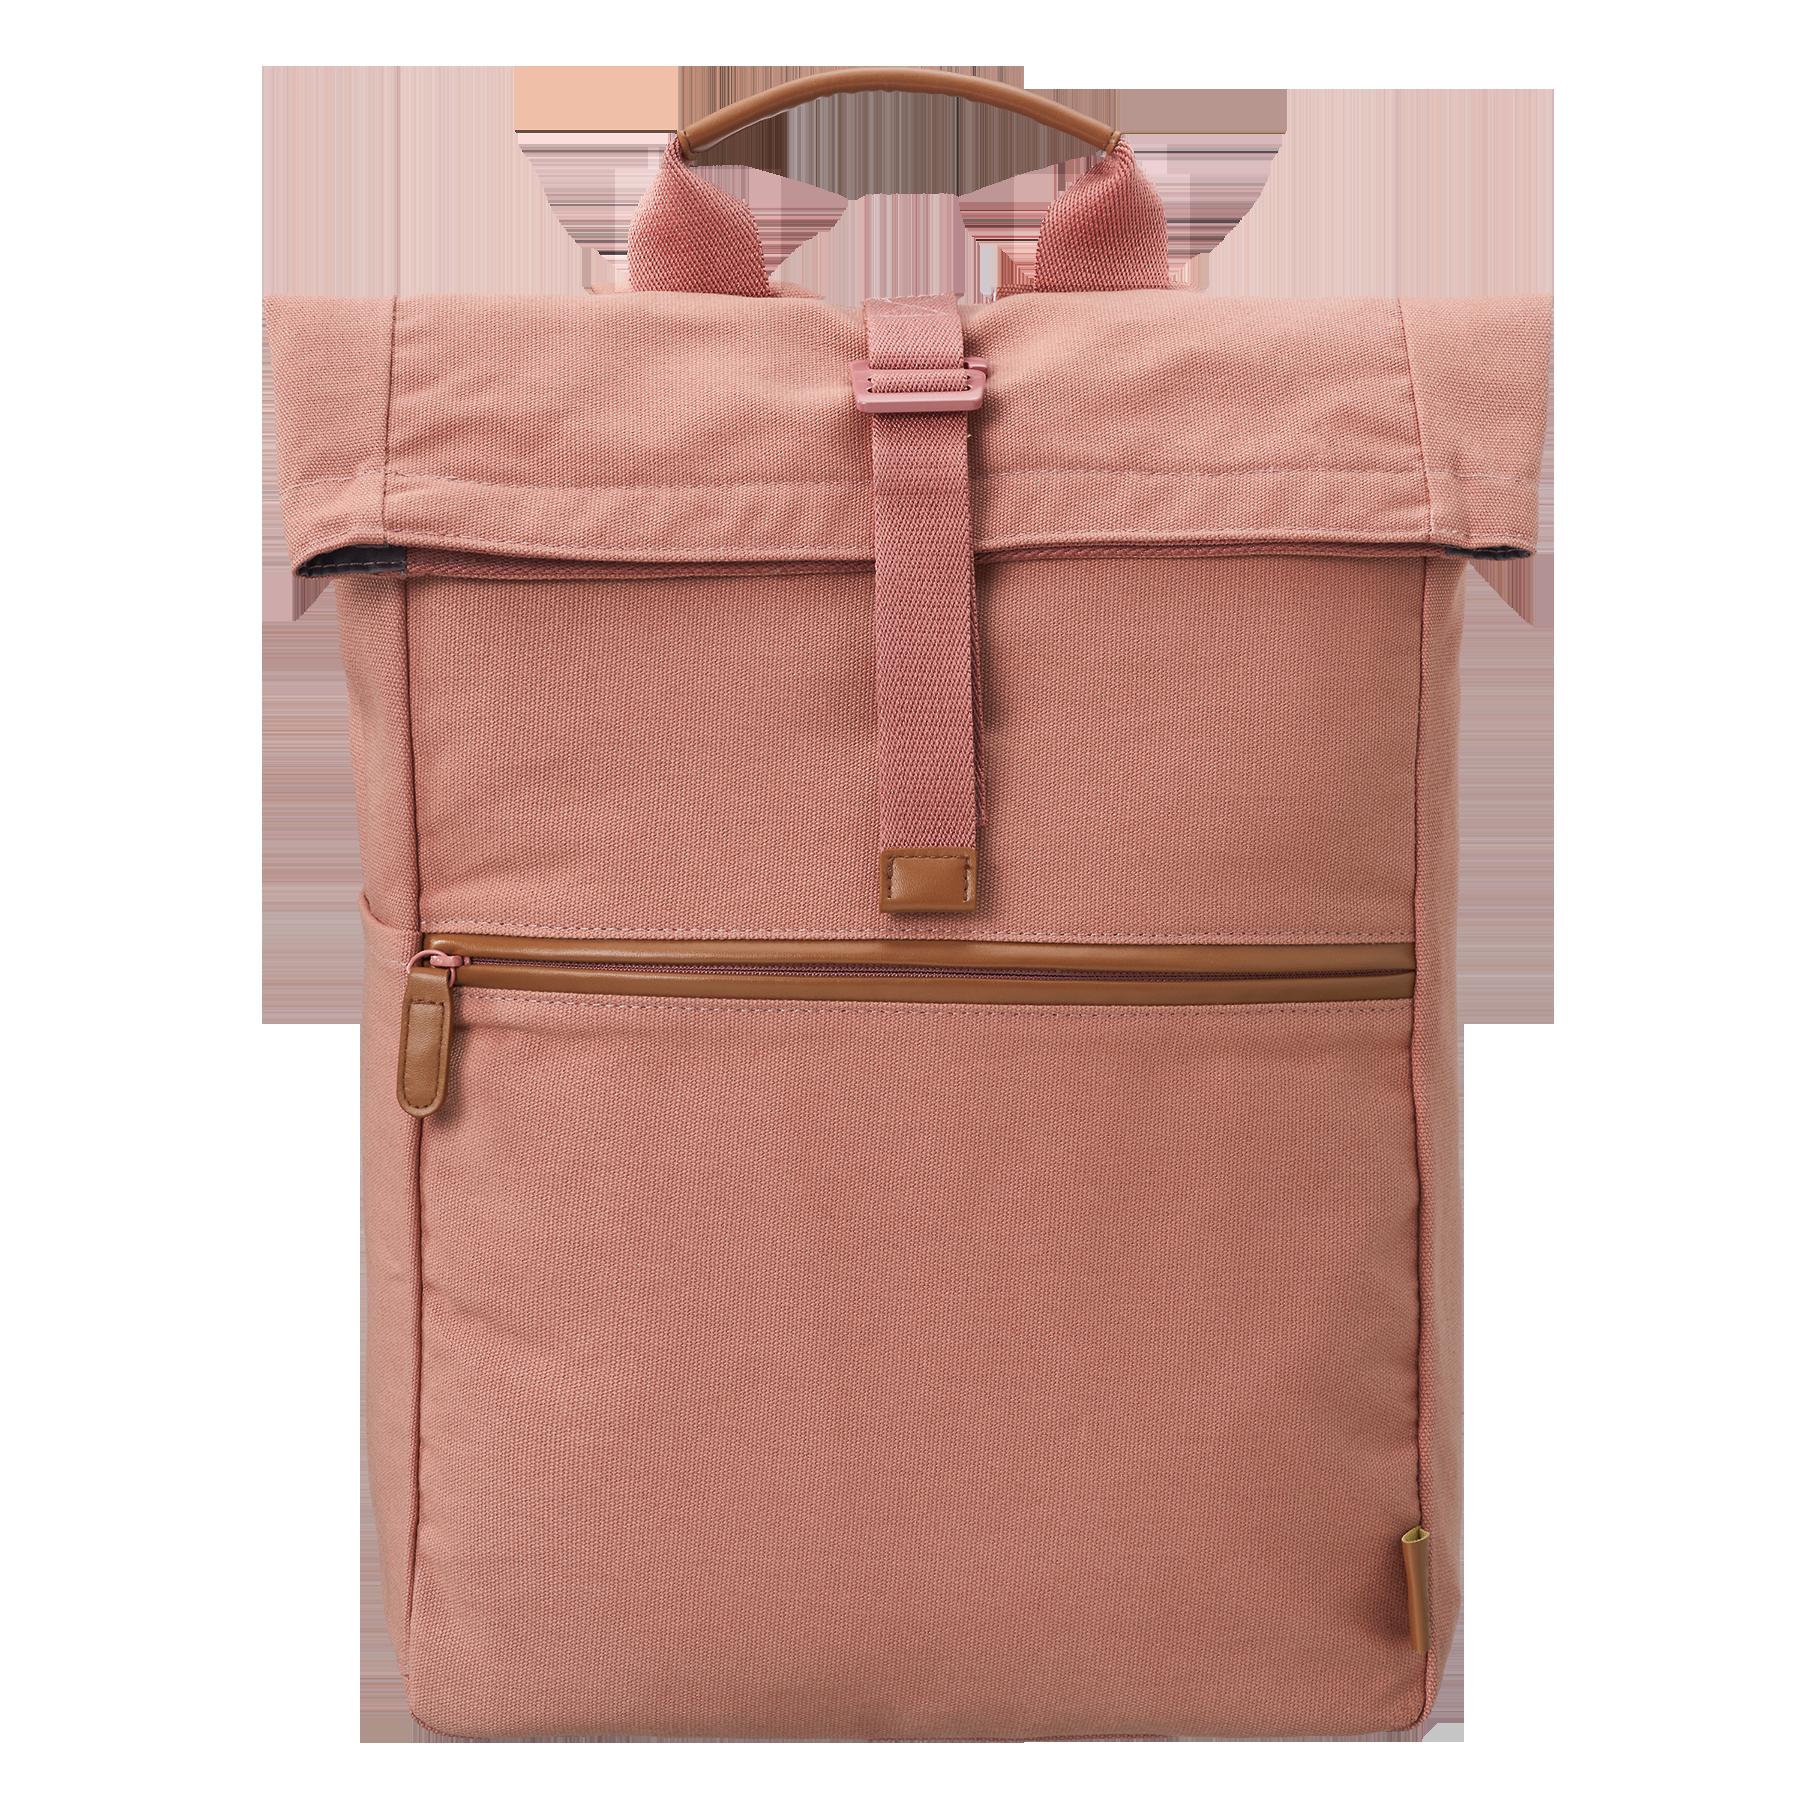 Afbeelding Fresk Backpack Uni Large I Ash Rose